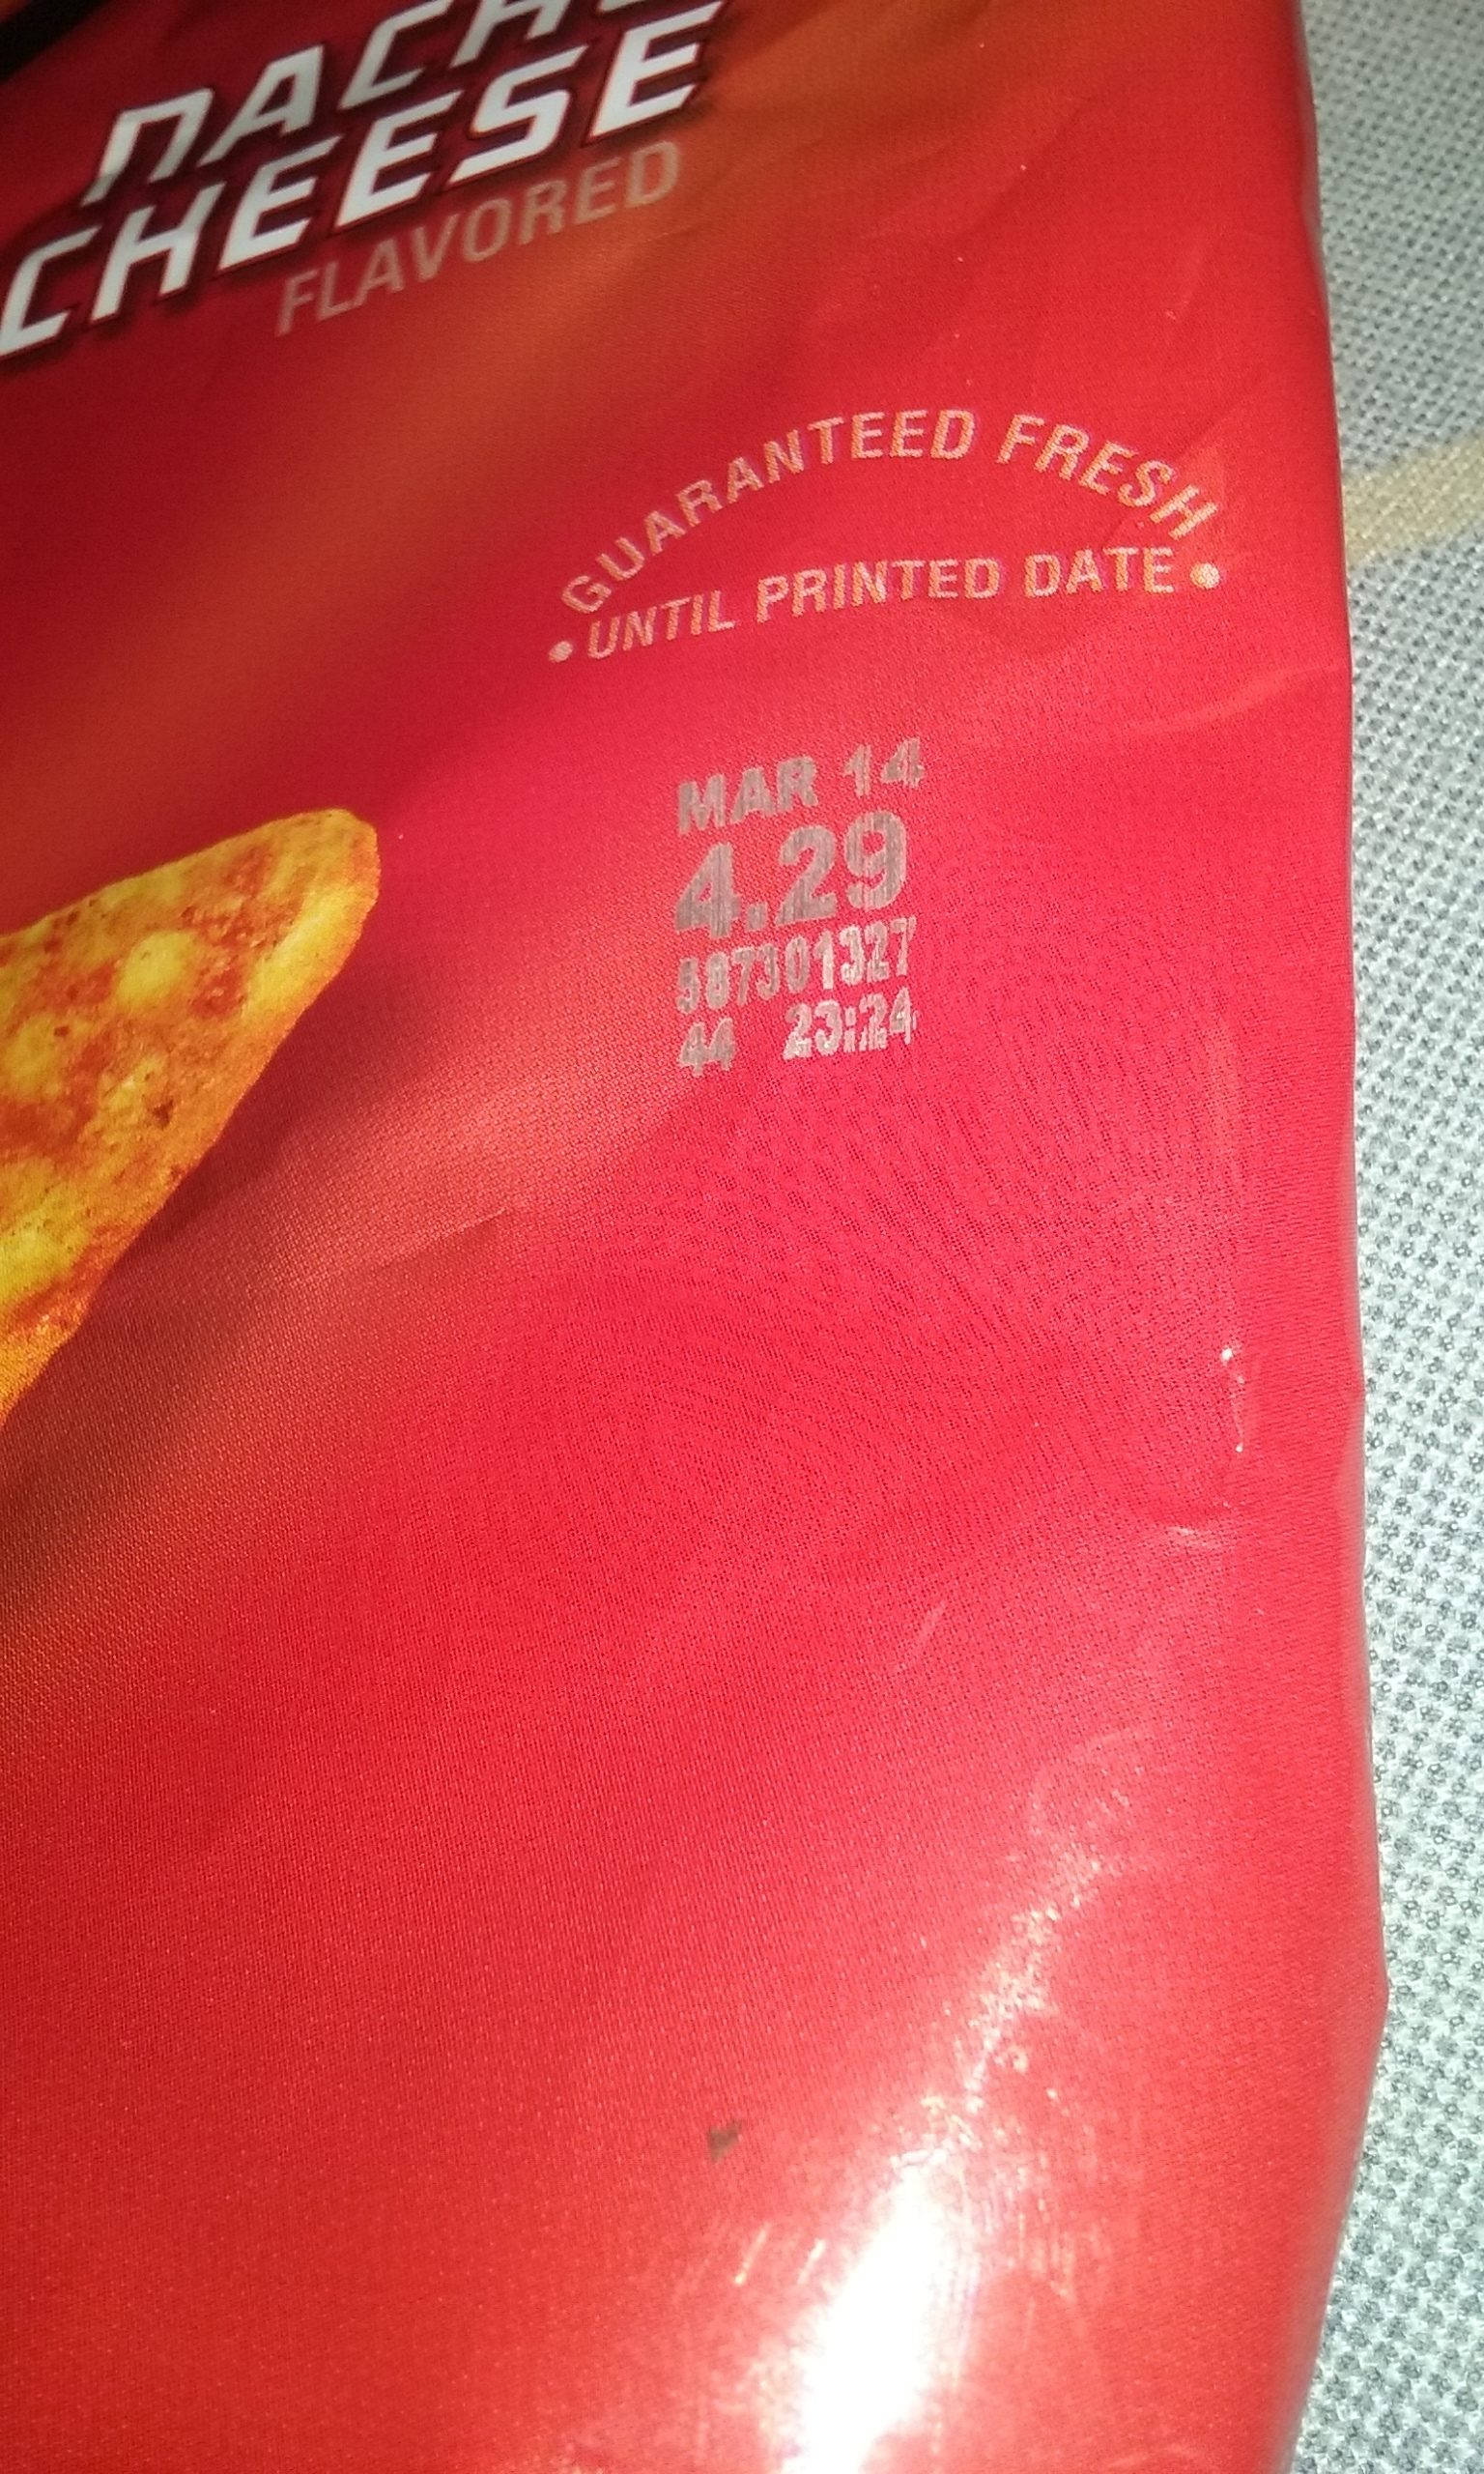 frito lay route sales